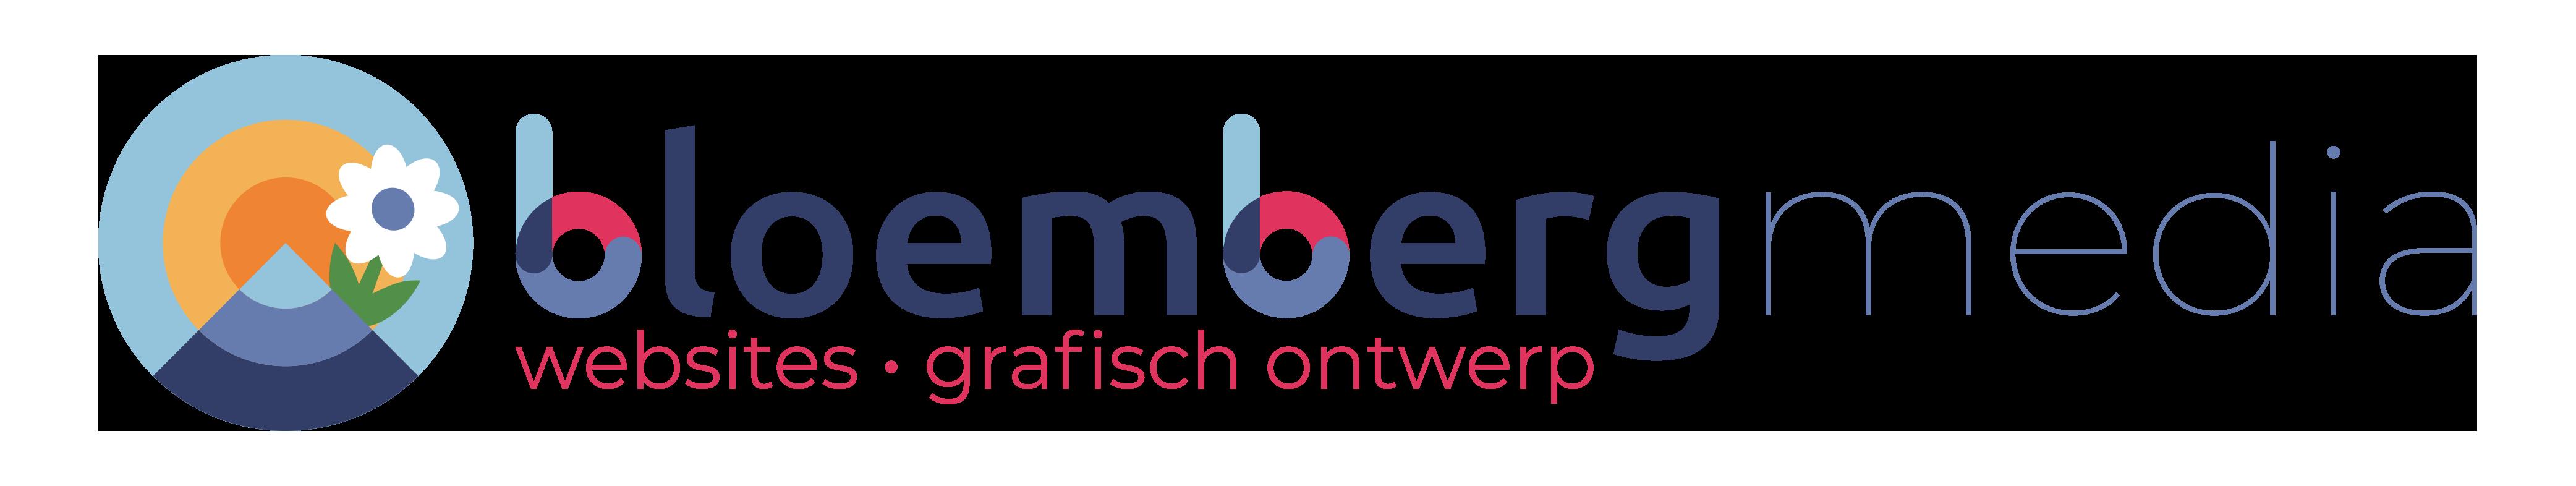 Bloemberg Media & Reclame